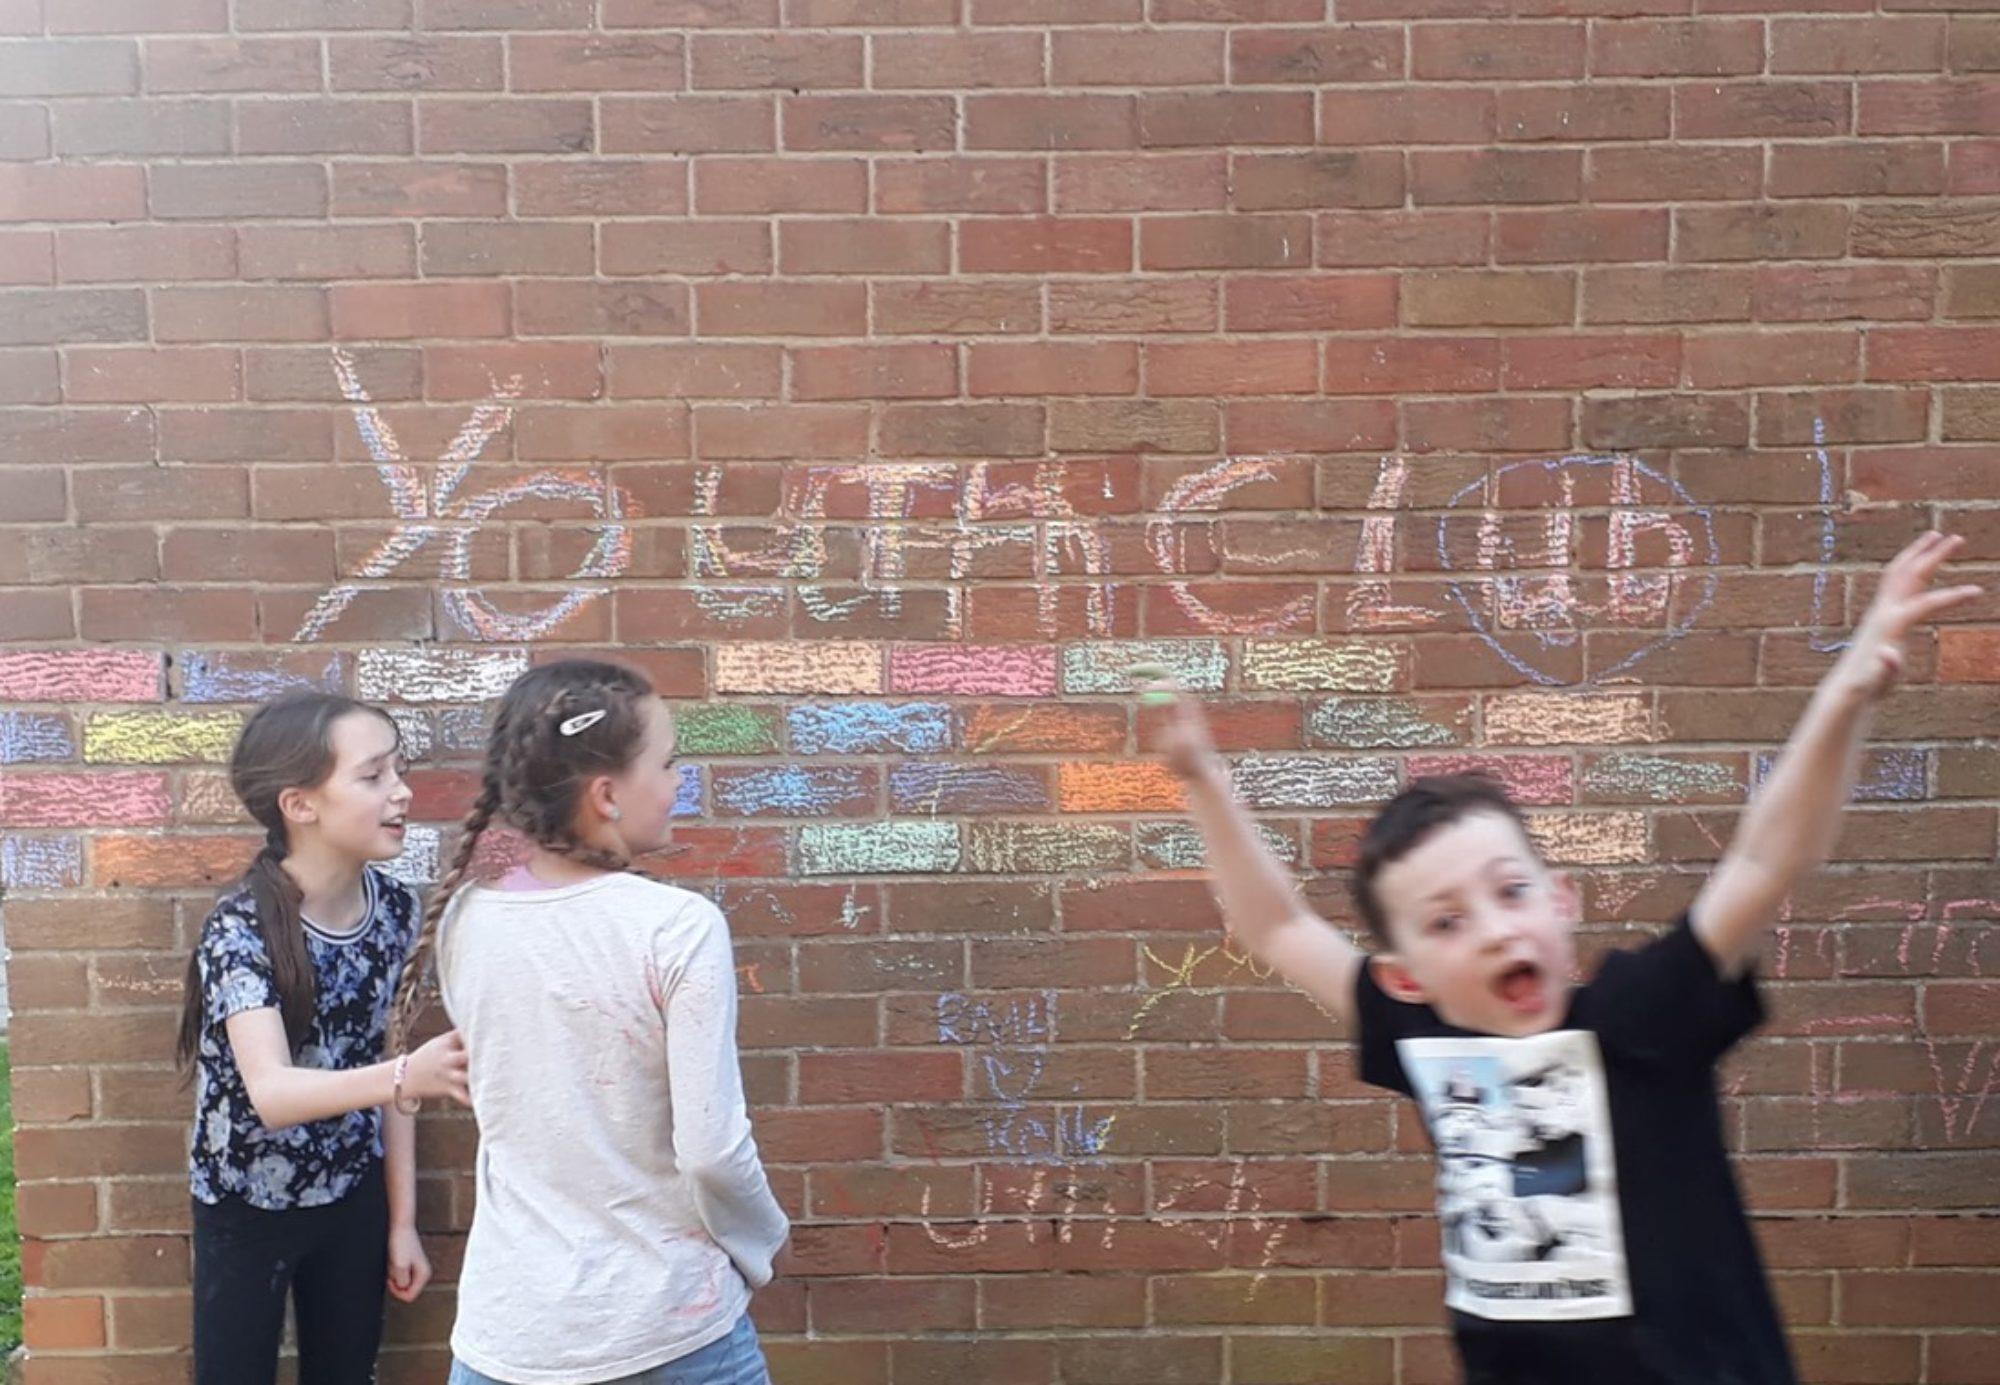 Denton Youth & Community Project